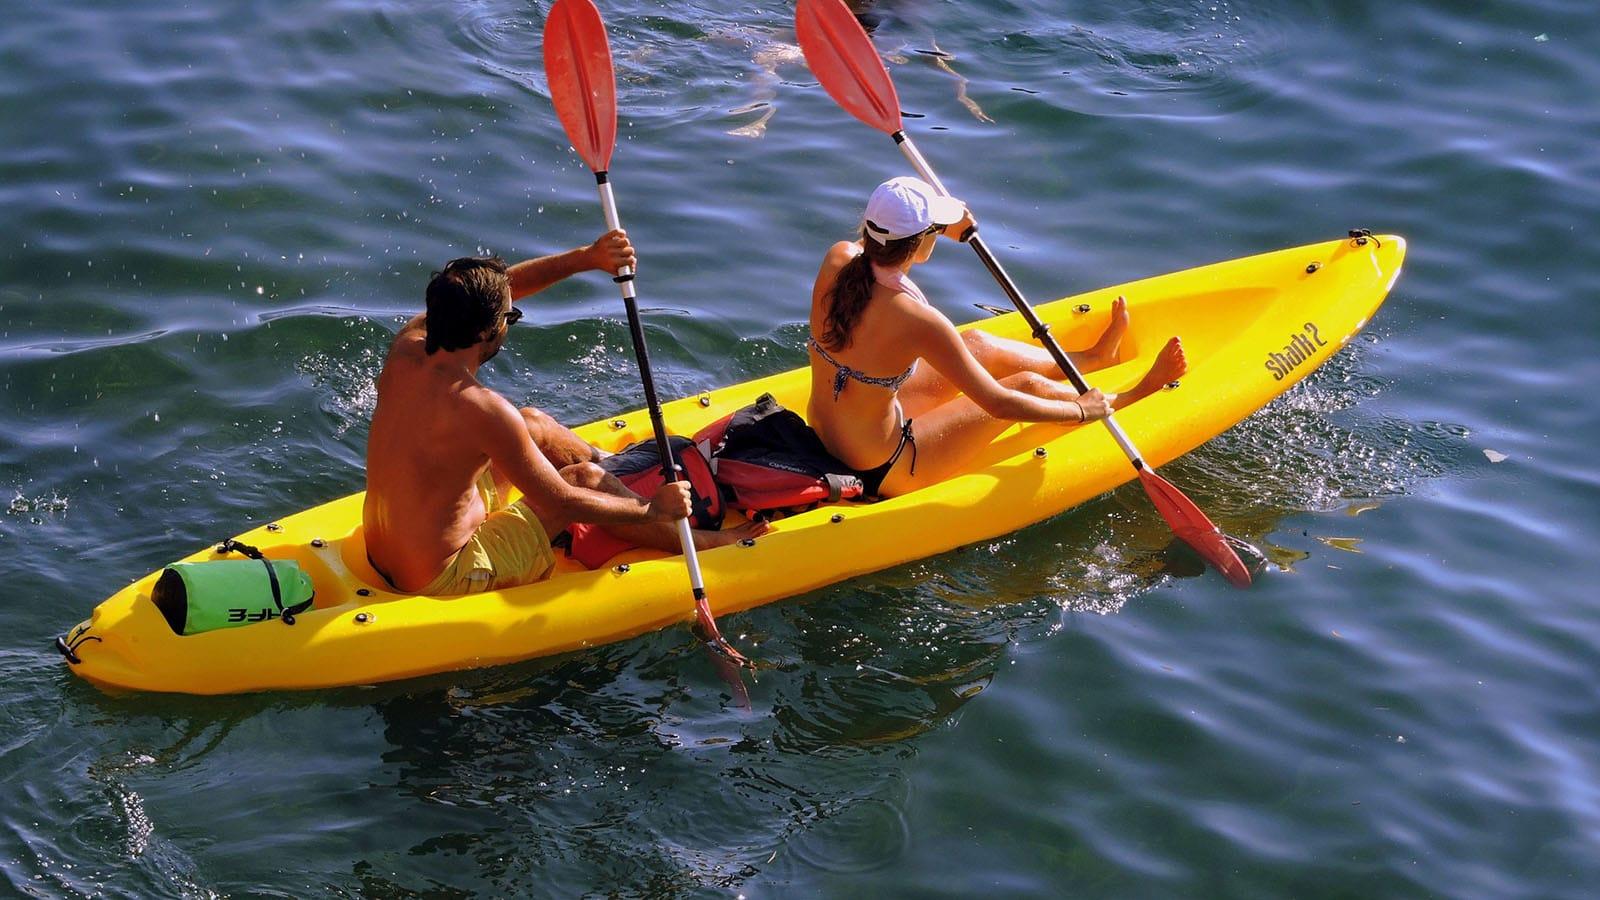 activites-nautiques-canoe-vendee-saintjeandemonts